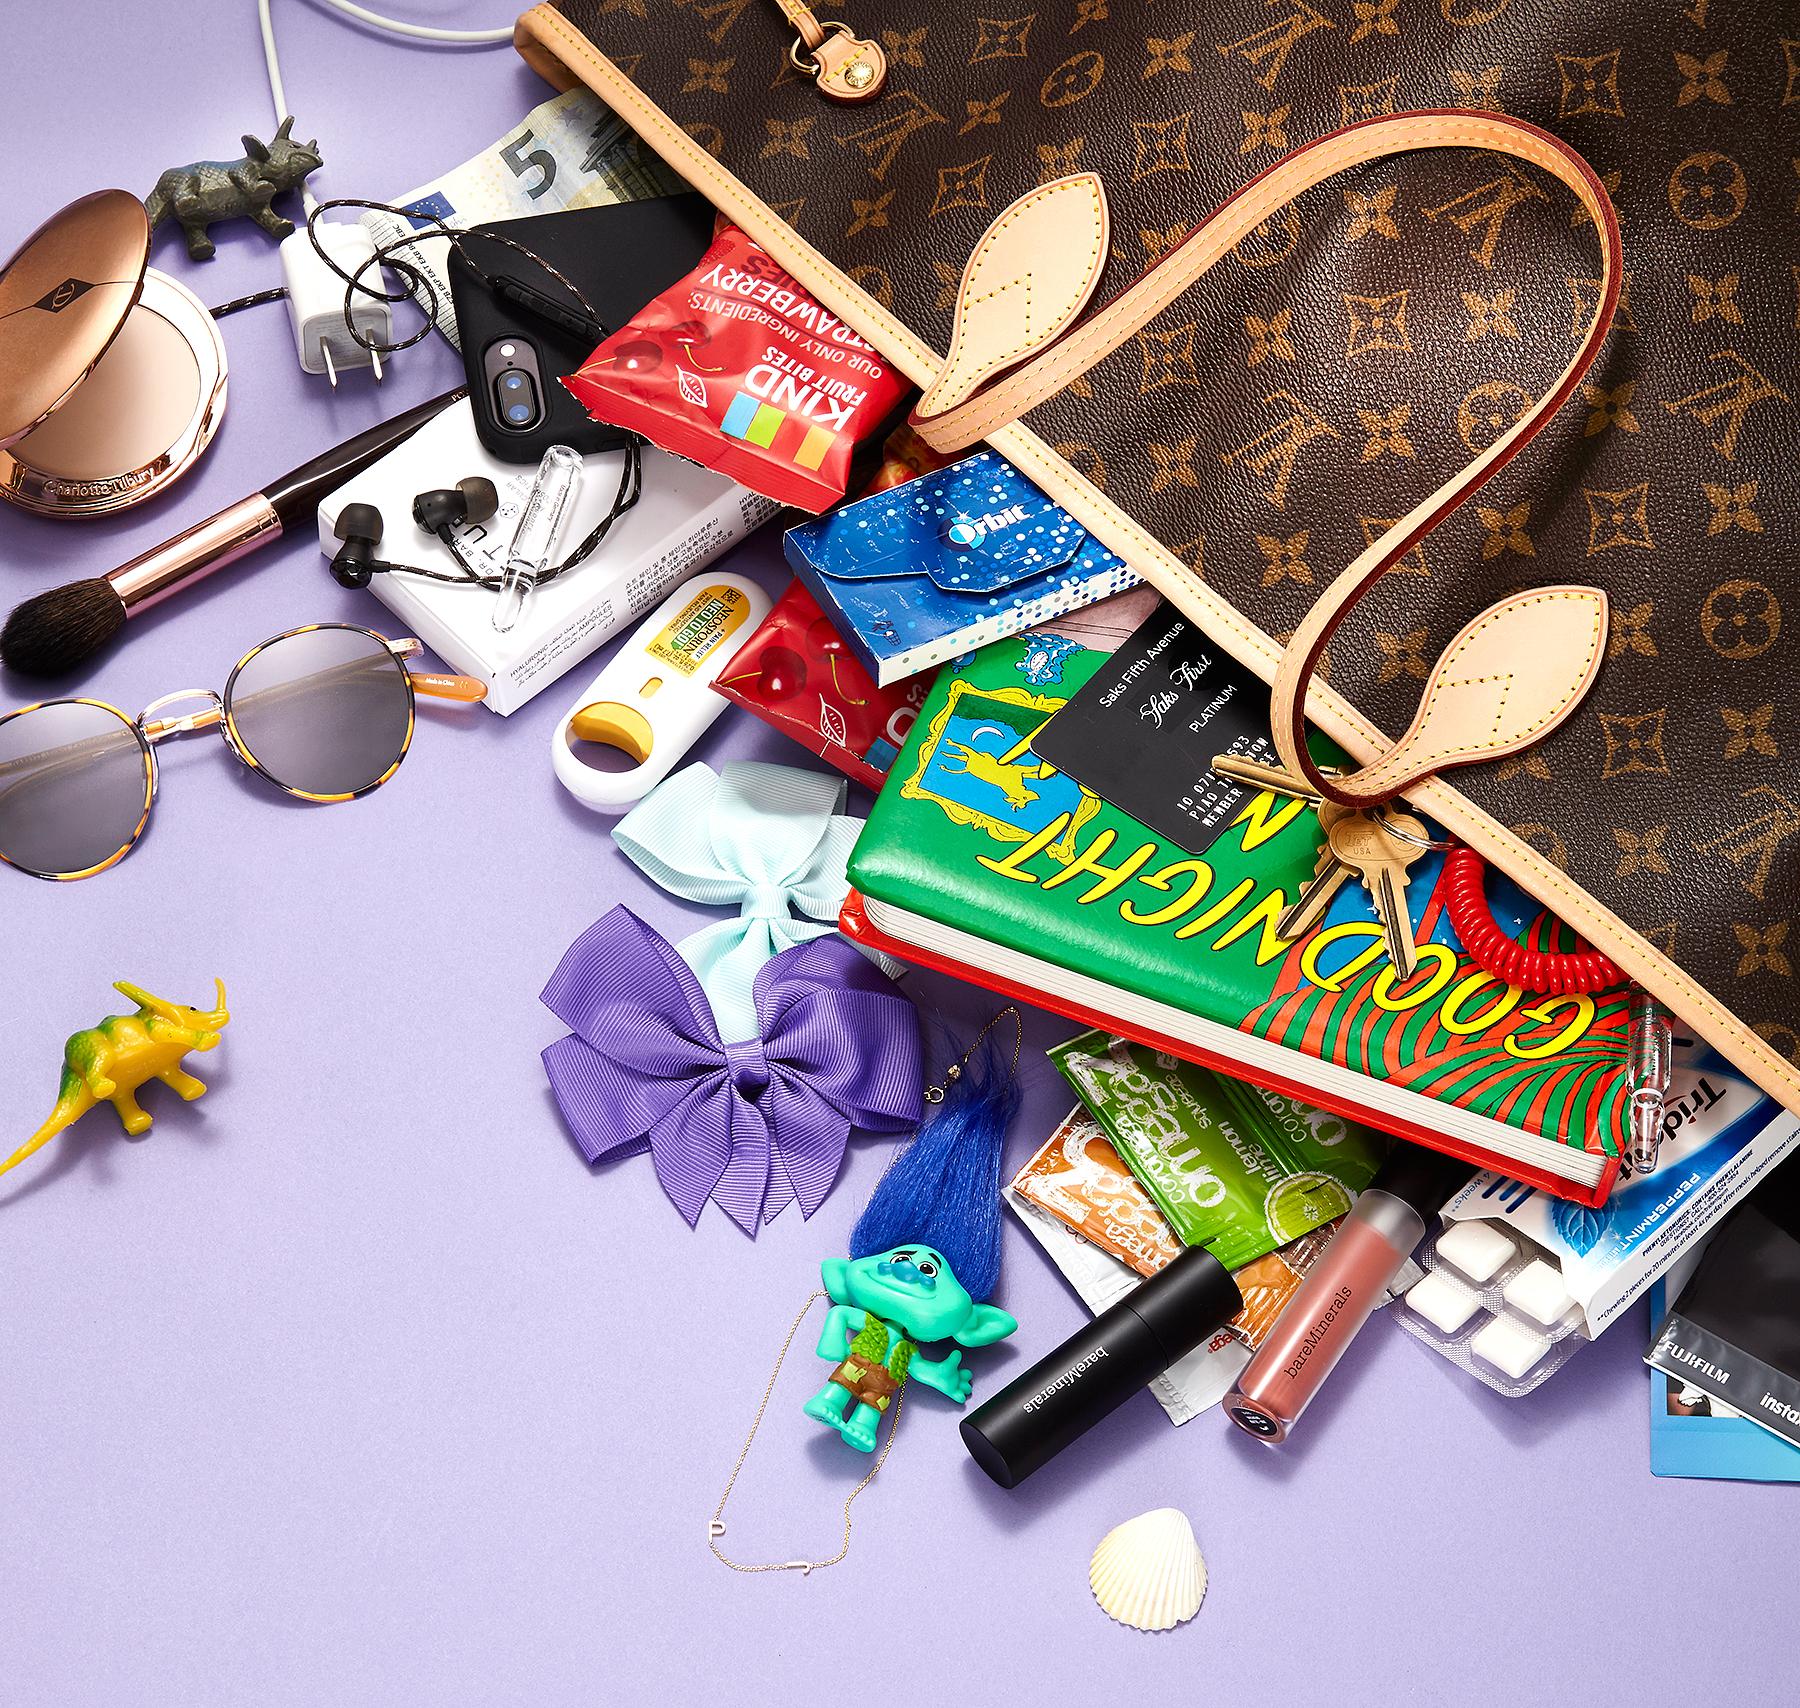 Daphne Oz's bag